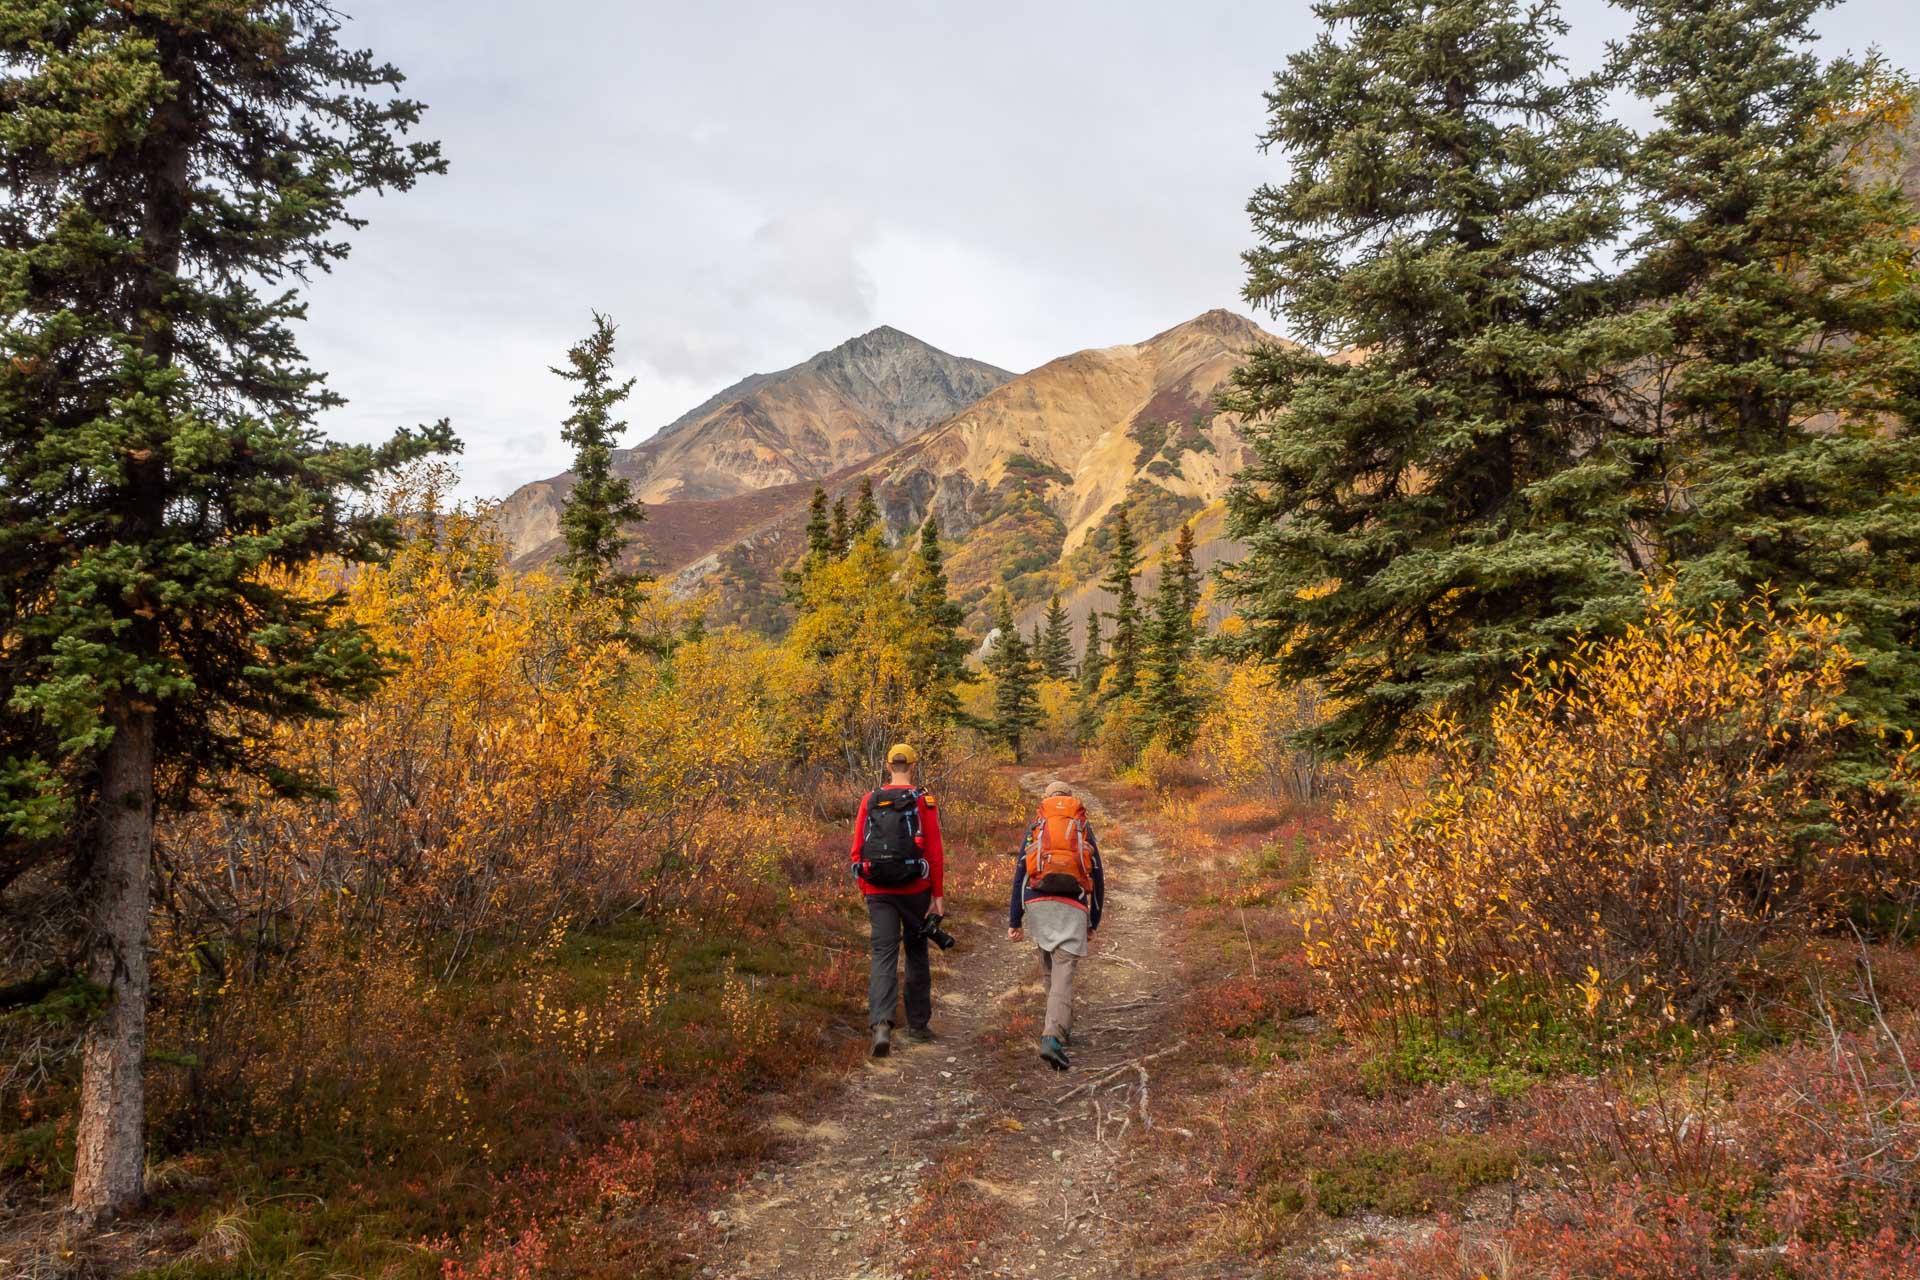 Wanderung um die Sheep Mountain Lodge